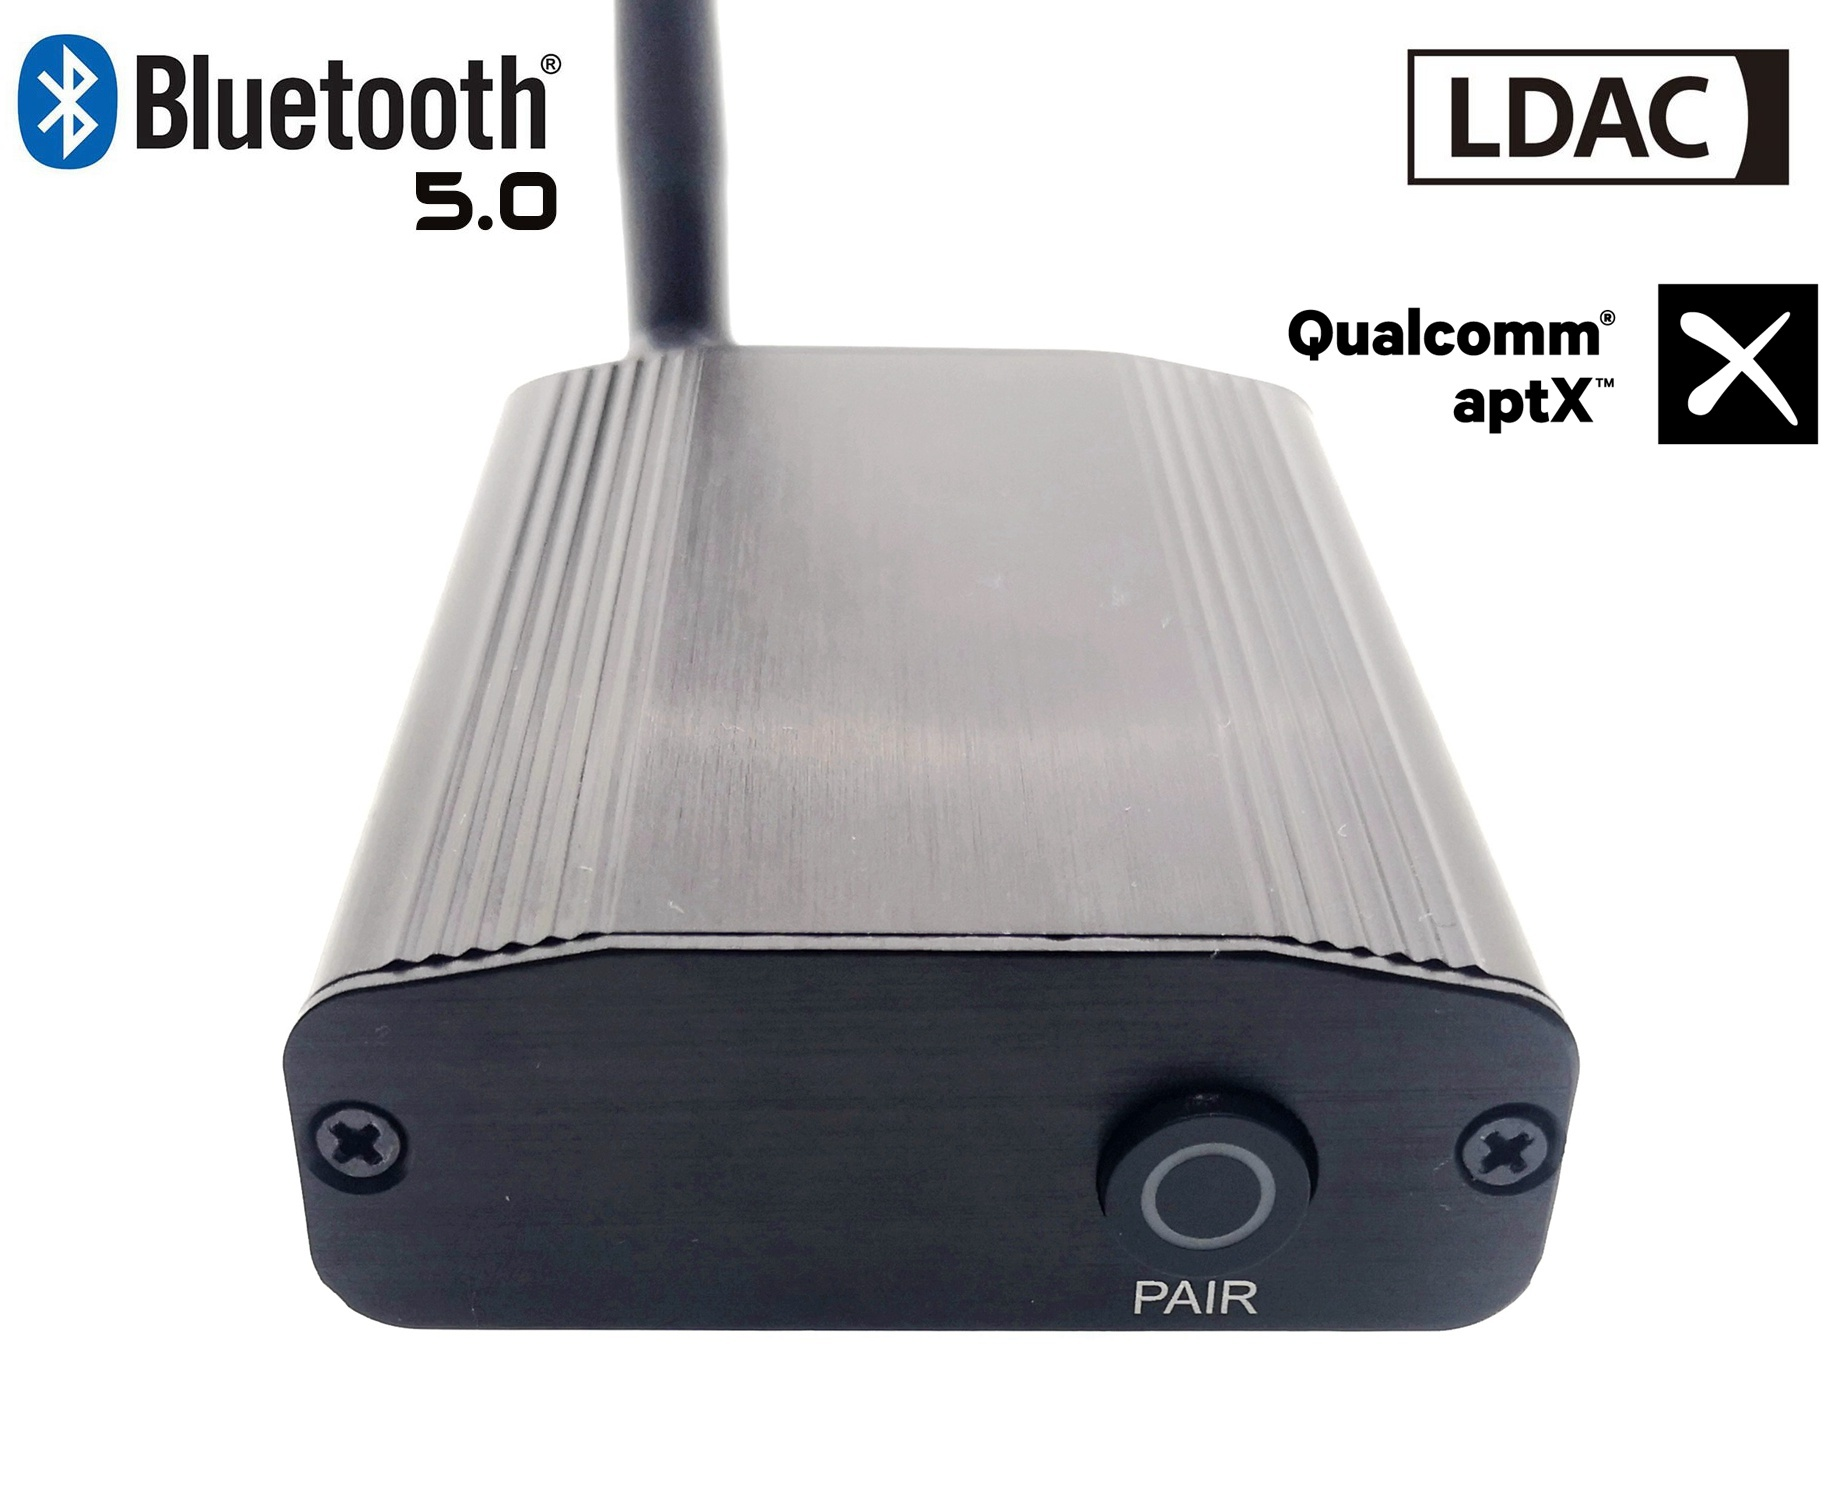 LDAC50 CSR8675-V5.0 Bluetooth LDAC Aptx To 24bit/96khz Coaxial Optical Digital Audio Bluetooth Audio Receiver Bluetooth 5.0